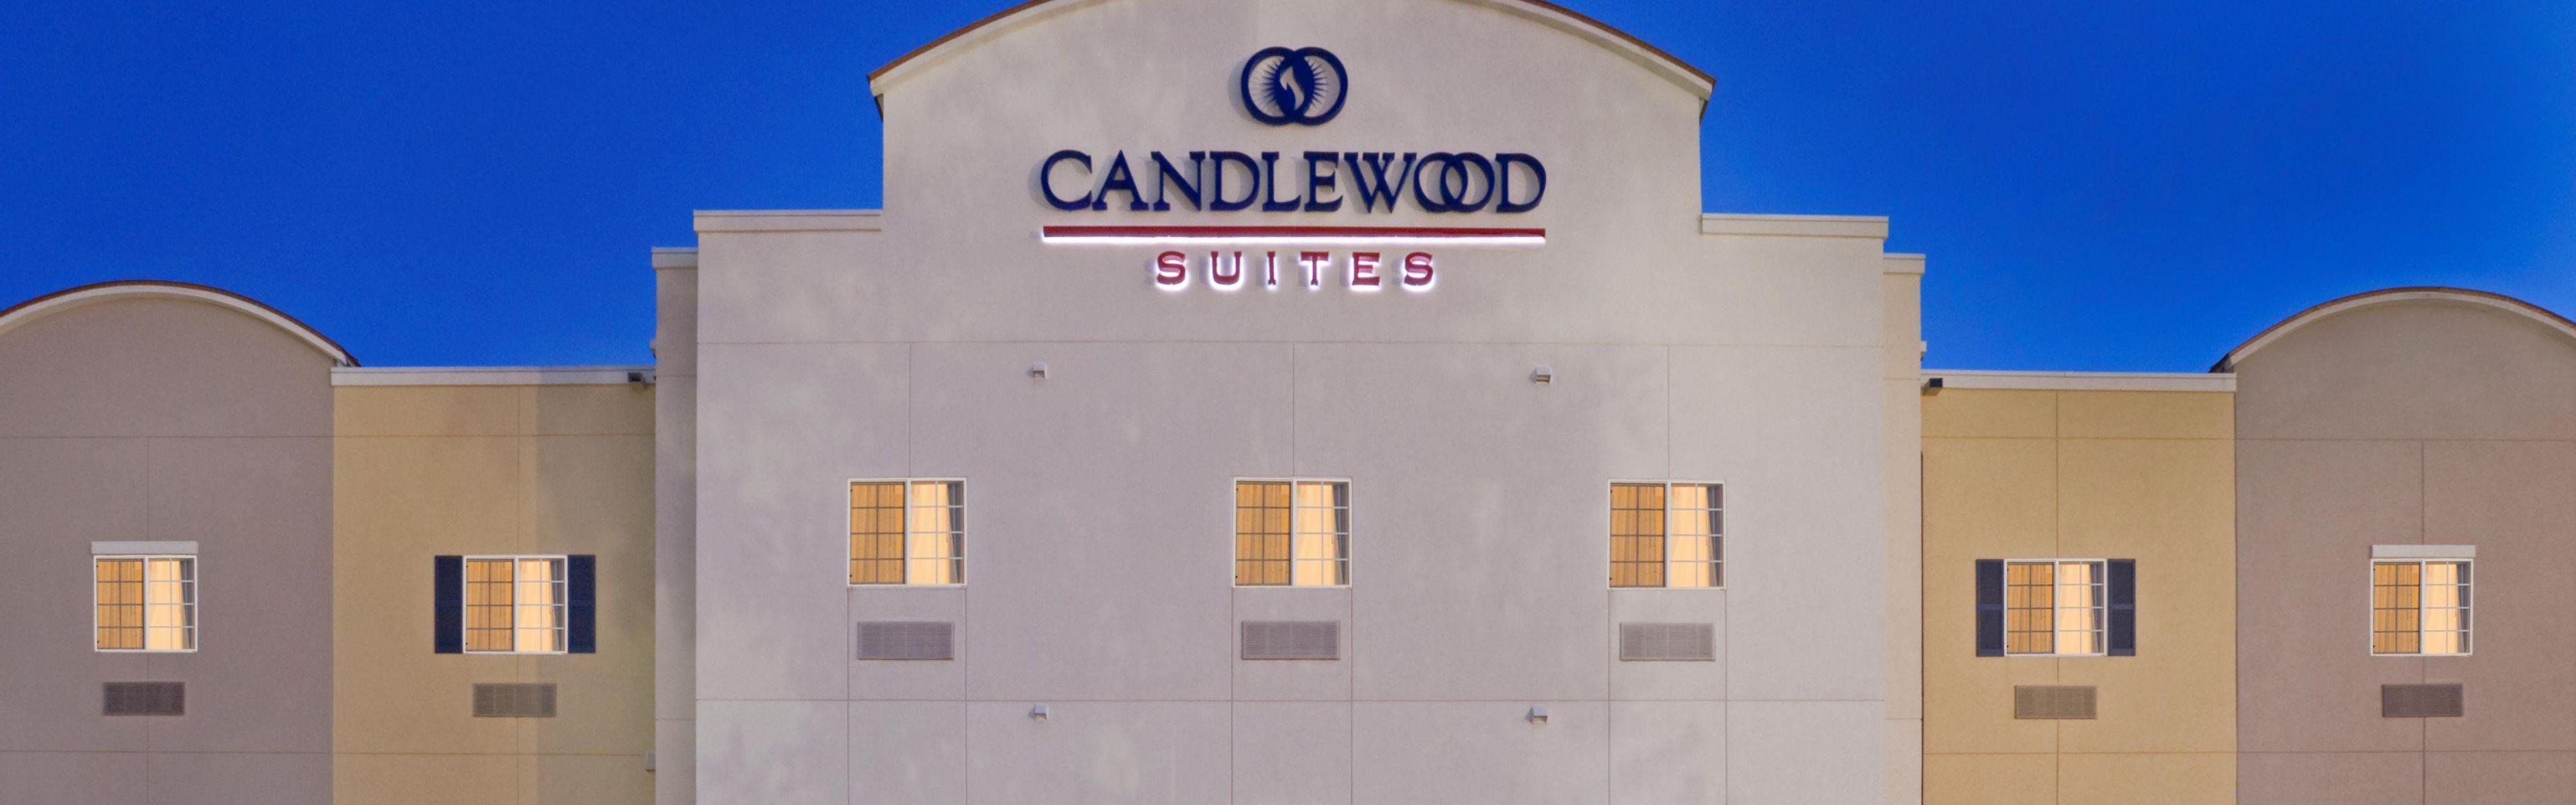 Candlewood Suites Mount Pleasant image 0